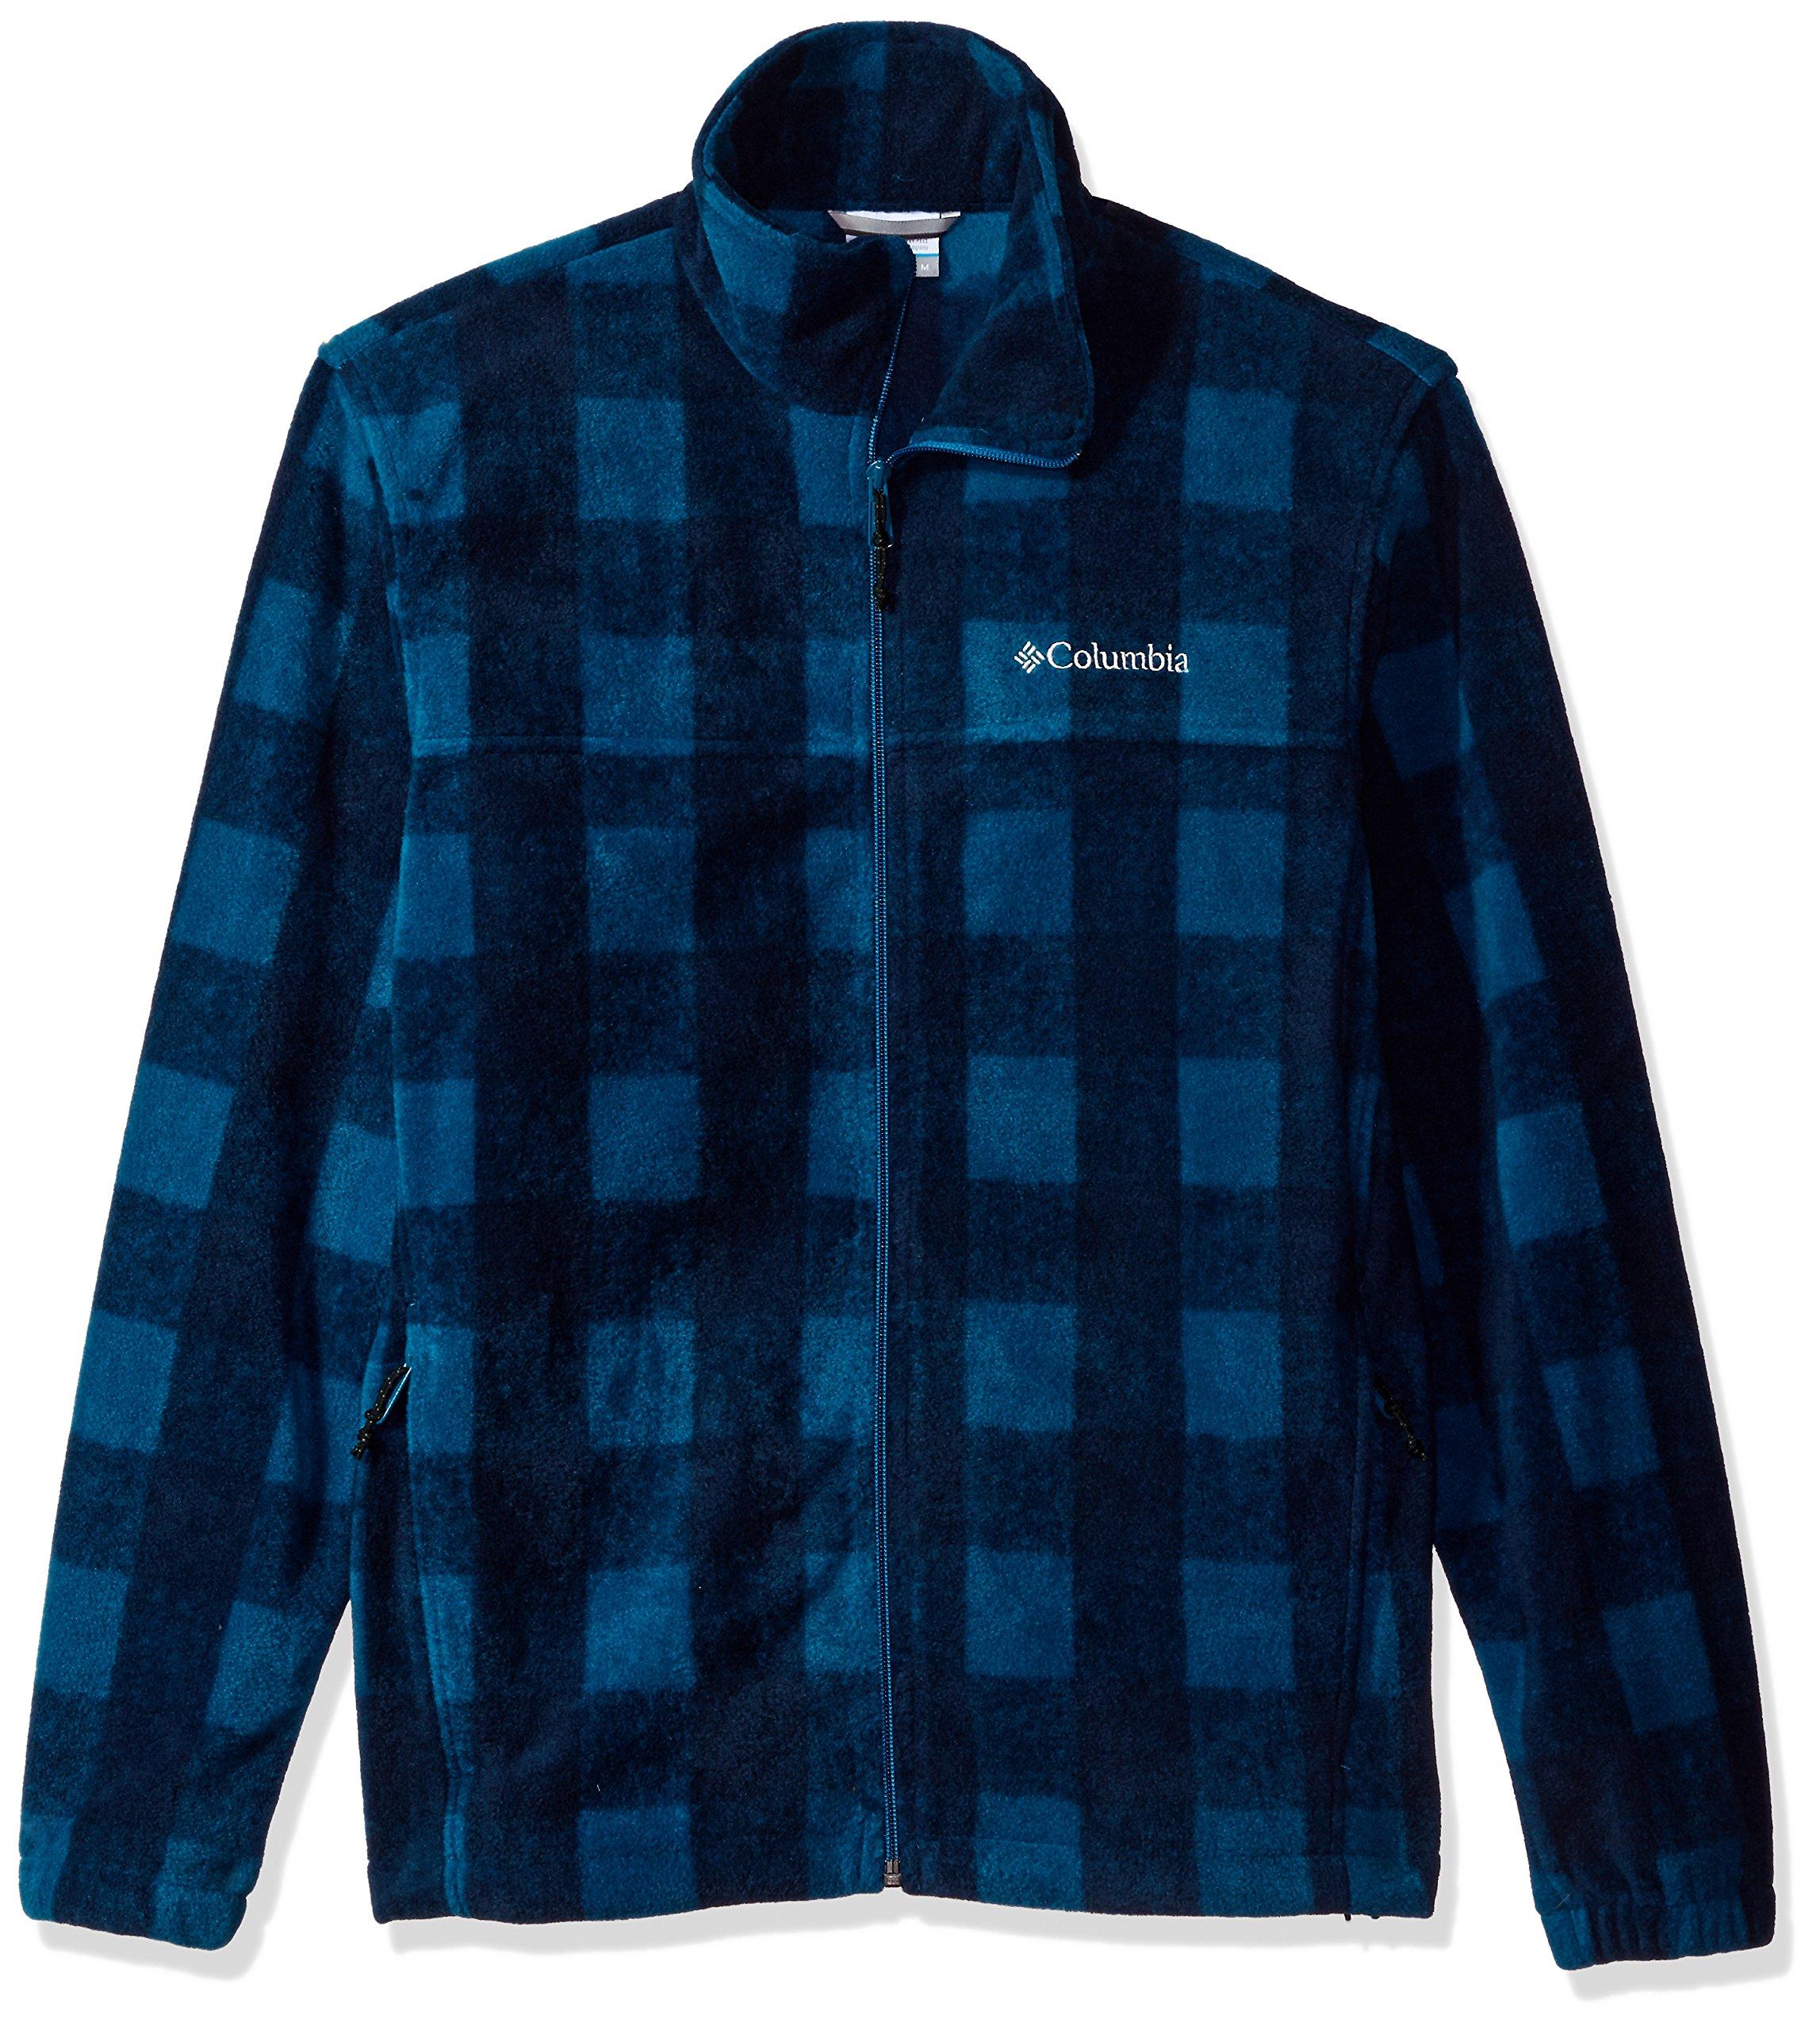 Columbia Men's Cascades Explorer Full Zip Fleece Jacket, Phoenix Blue PLD, Medium by Columbia